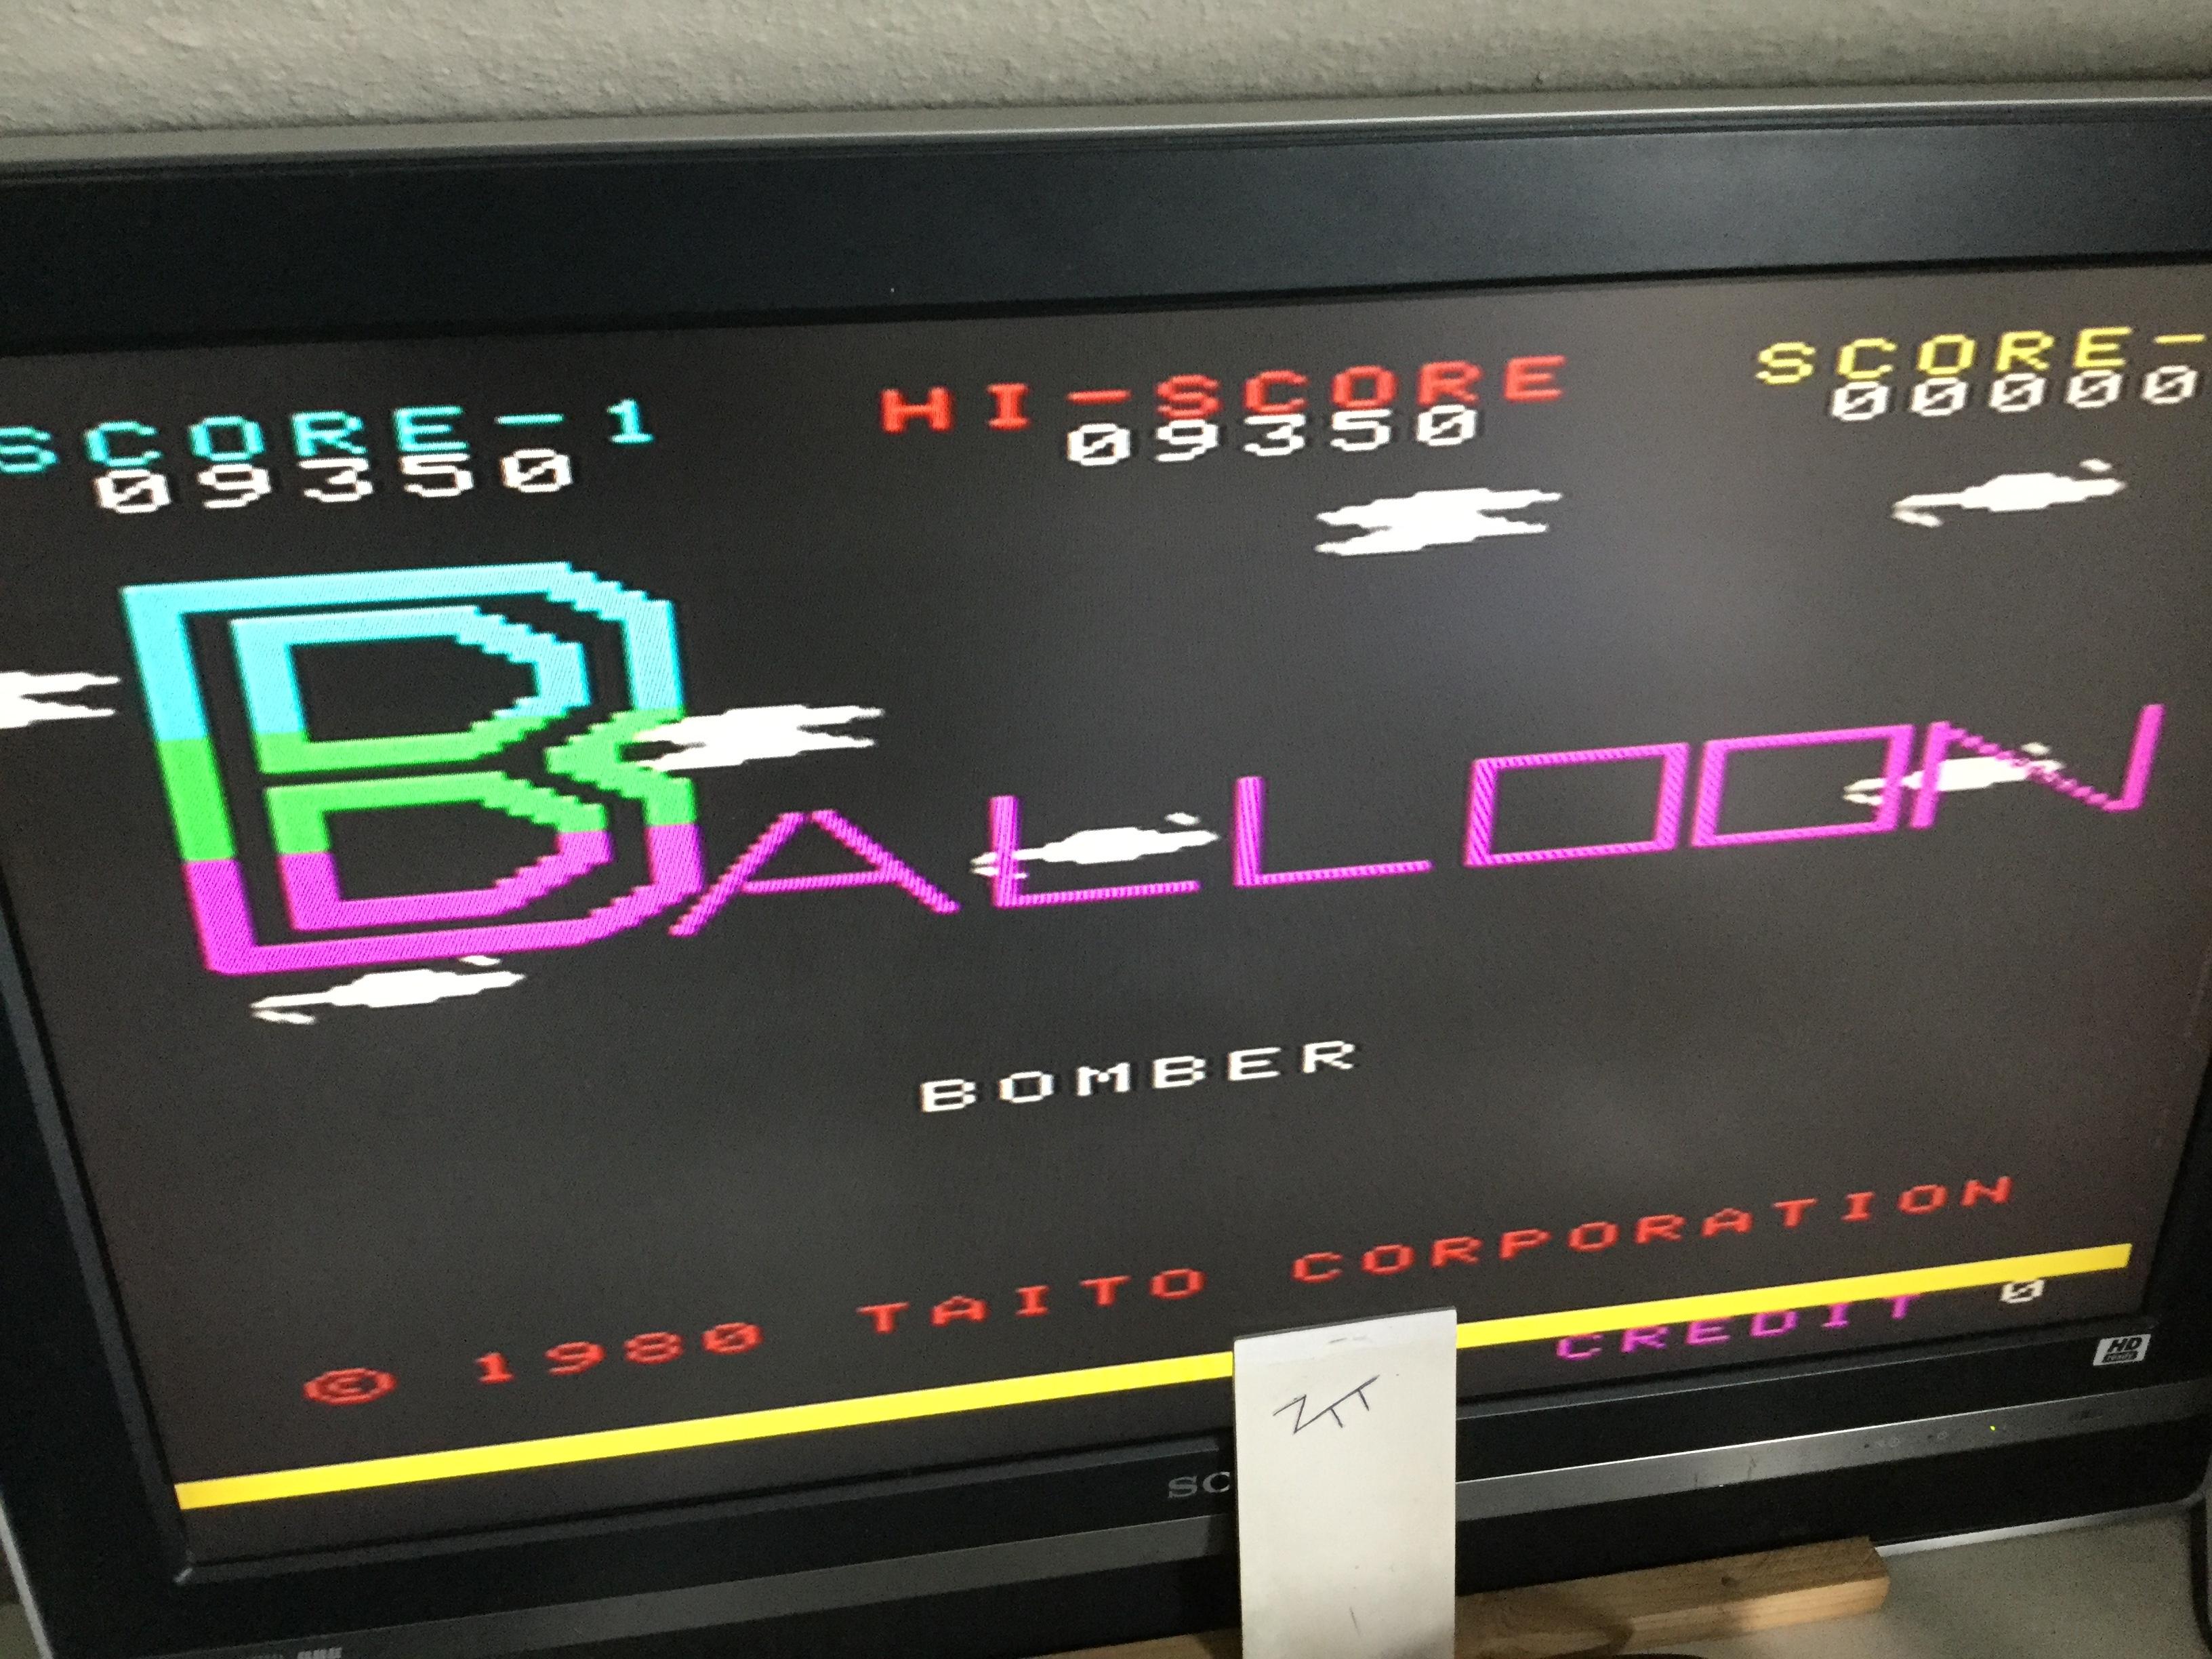 Frankie: Taito Legends 2: Balloon Bomber [Medium] (Playstation 2) 9,350 points on 2018-01-01 05:09:48